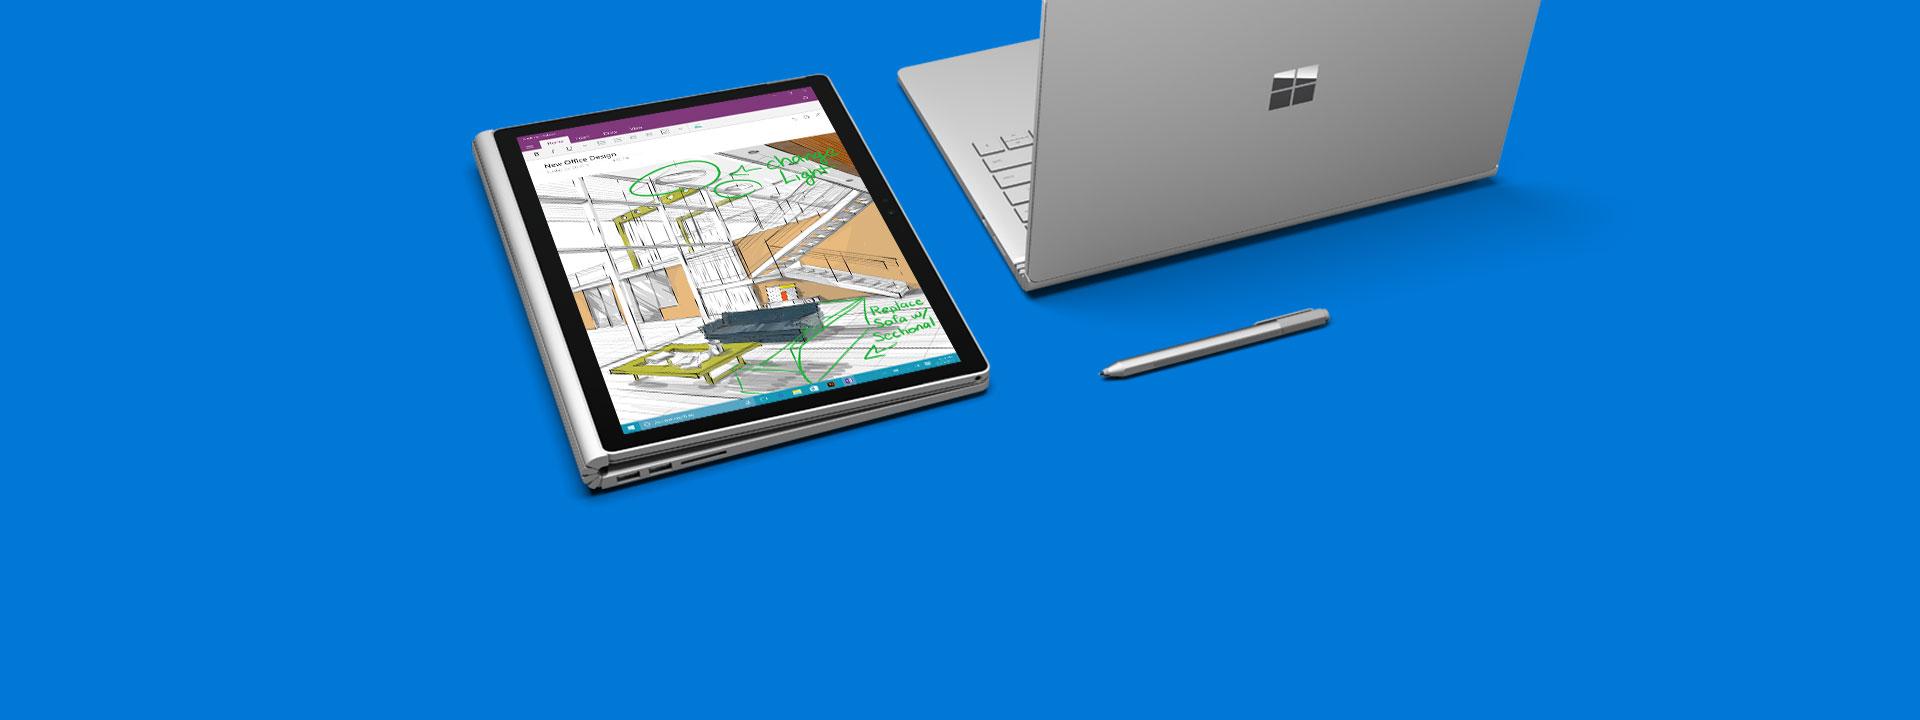 Surface Book の詳細情報。